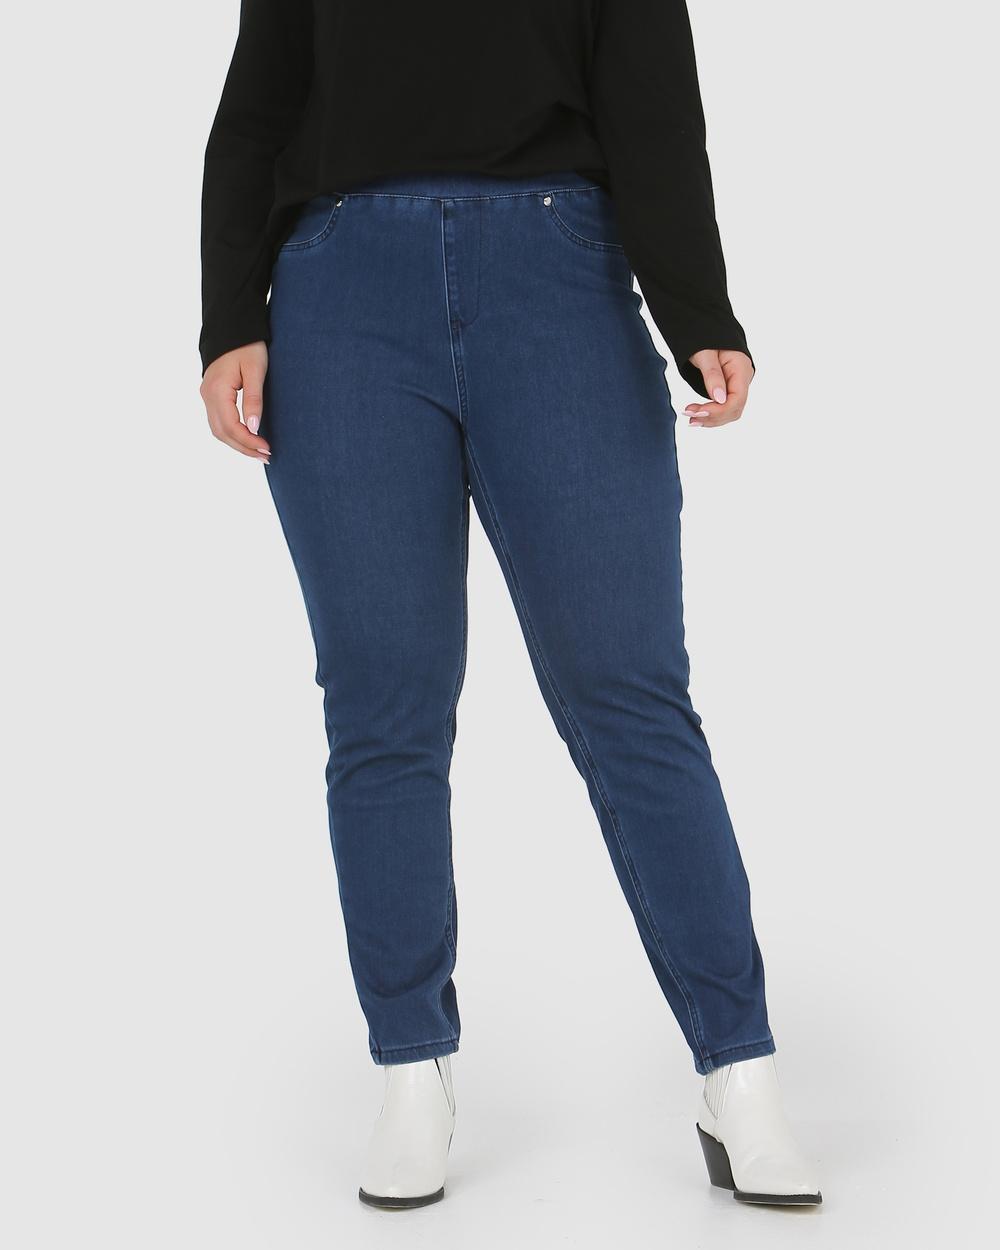 Advocado Plus Carmen Pull On Jeans Pants Medium Blue